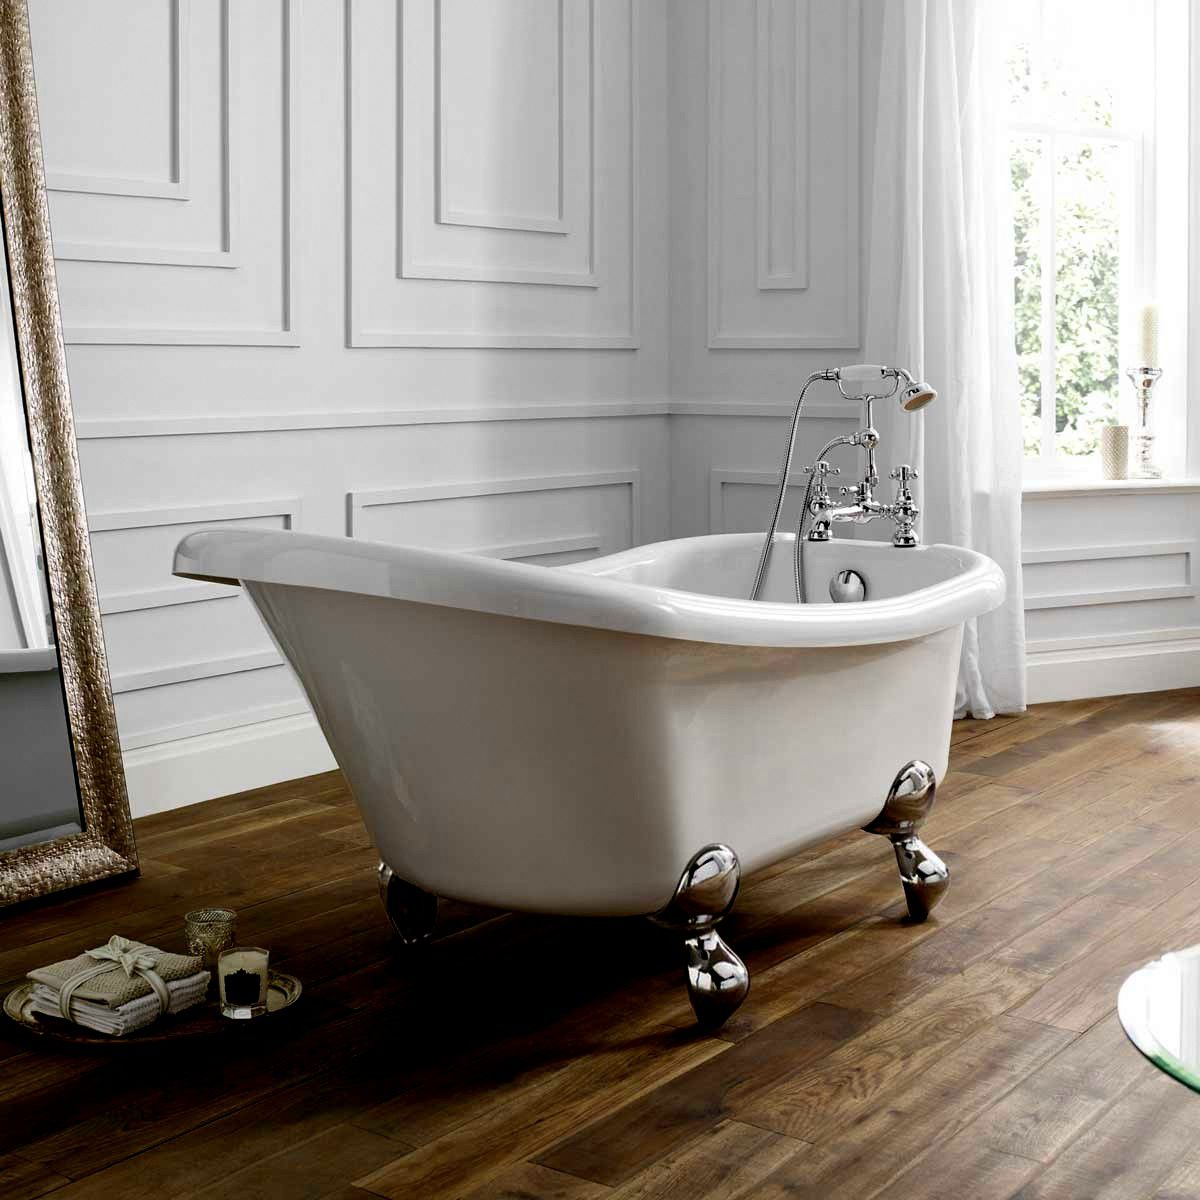 Slipper Bath Uk April eldwick victorian freestanding slipper bath uk bathrooms april eldwick victorian freestanding slipper bath sisterspd